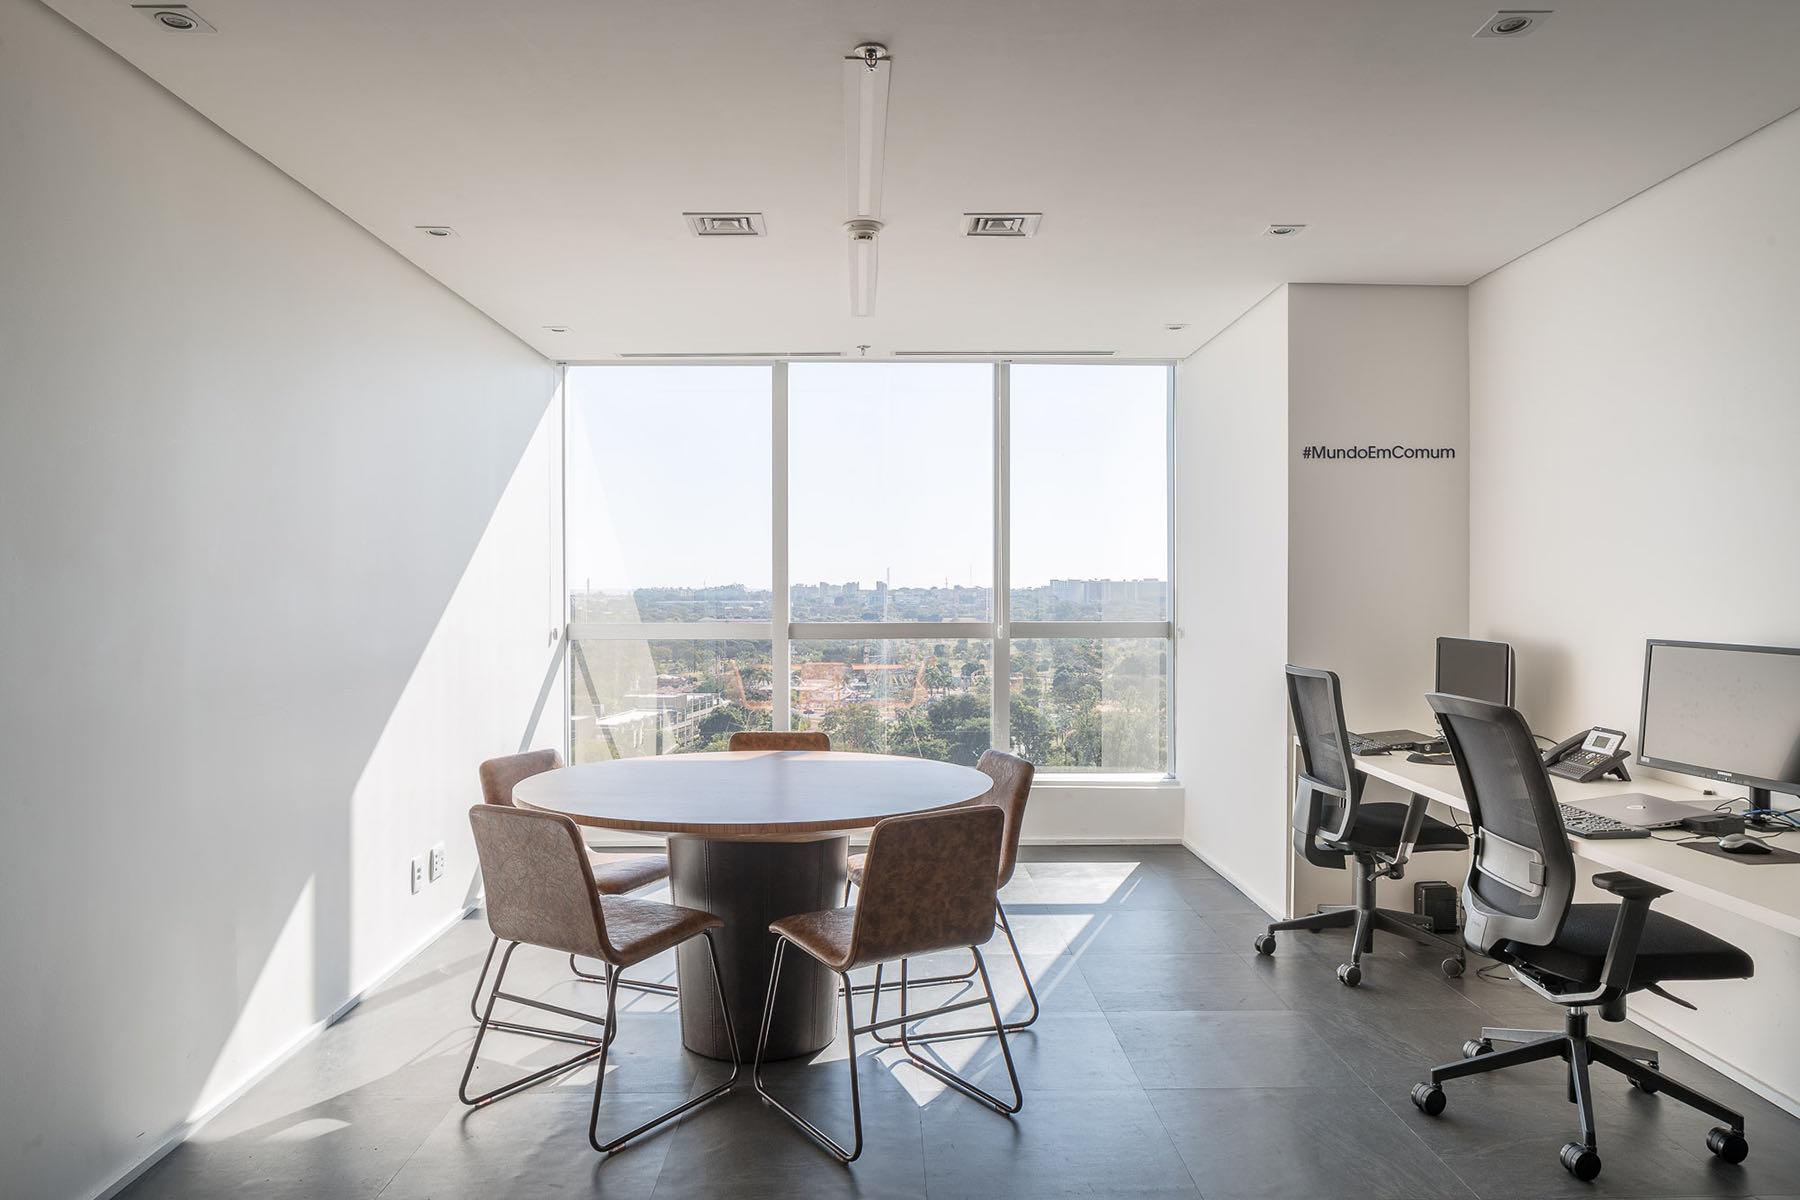 french-development-agency-office-15